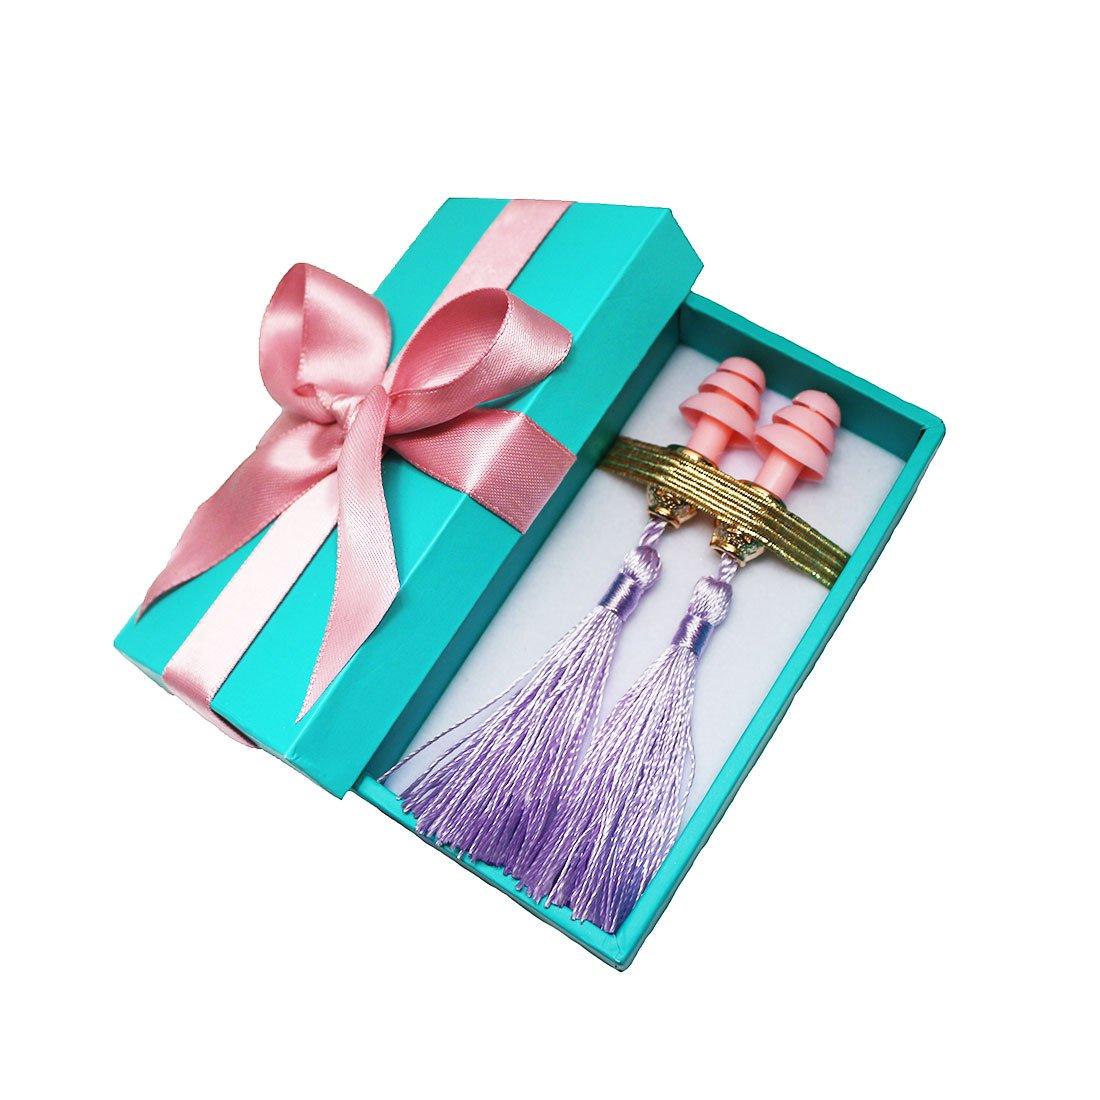 Gift Boxed Earplugs - Audrey Hepburn Breakfast at Tiffanys, Purple Tassel, Handmade